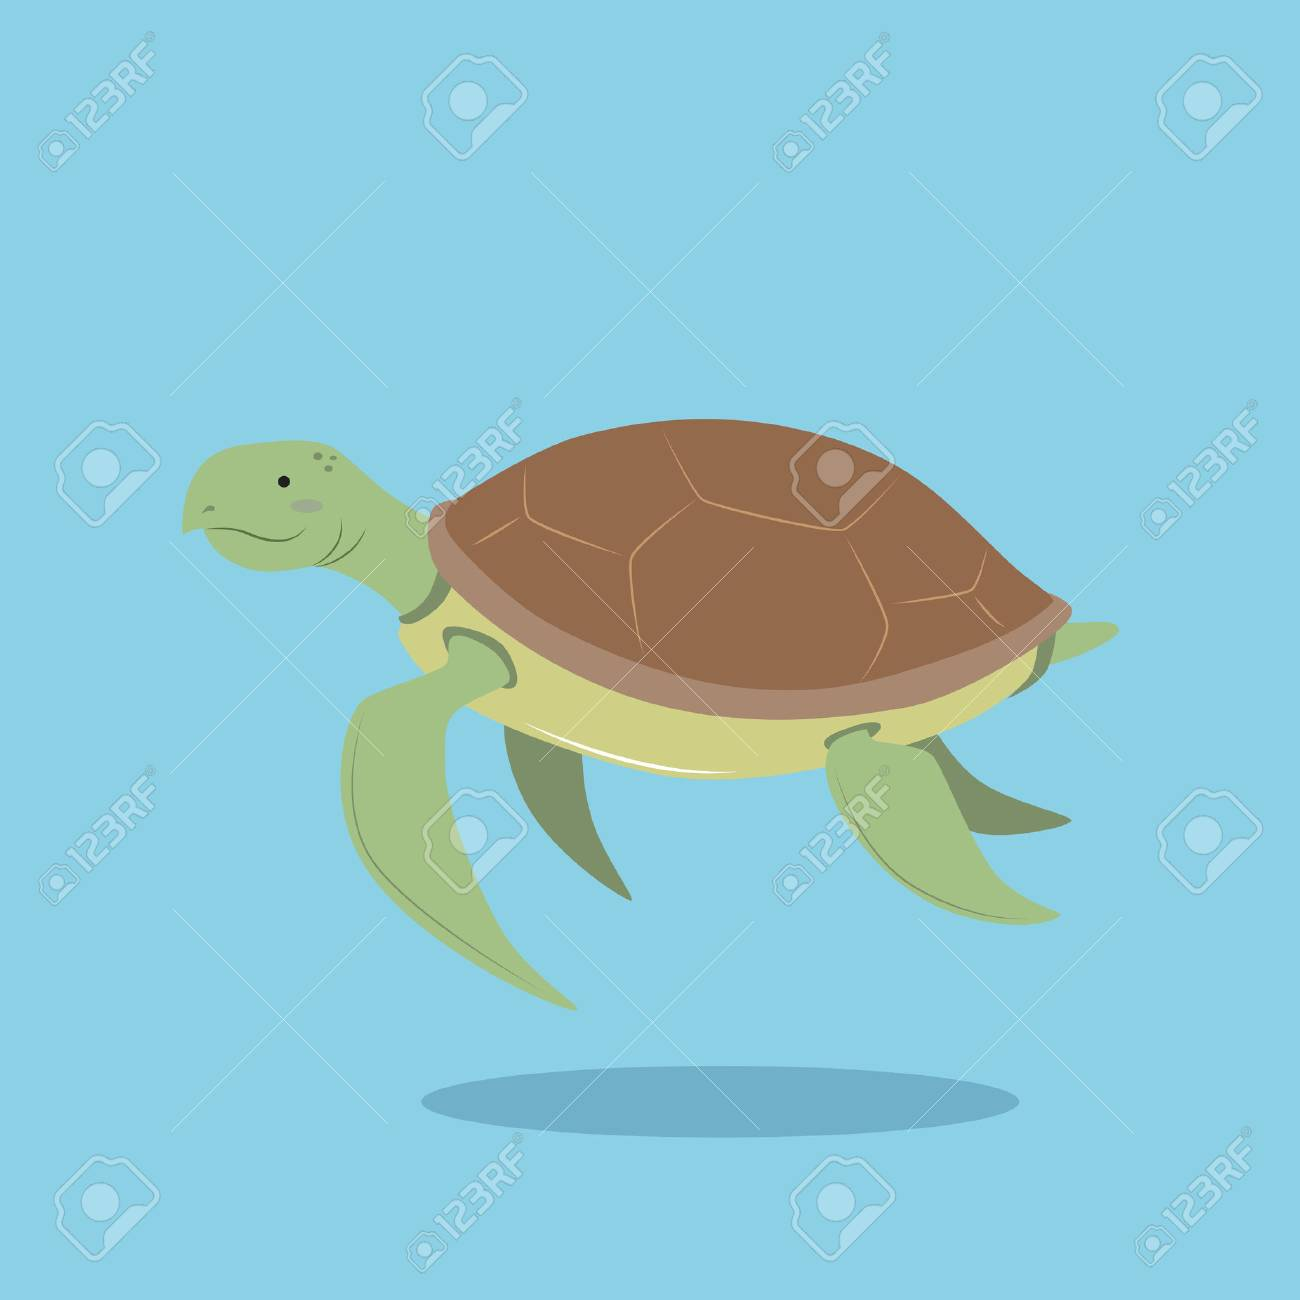 Vector Cartoon Illustration Of Sea Turtle In Flat Simple Design